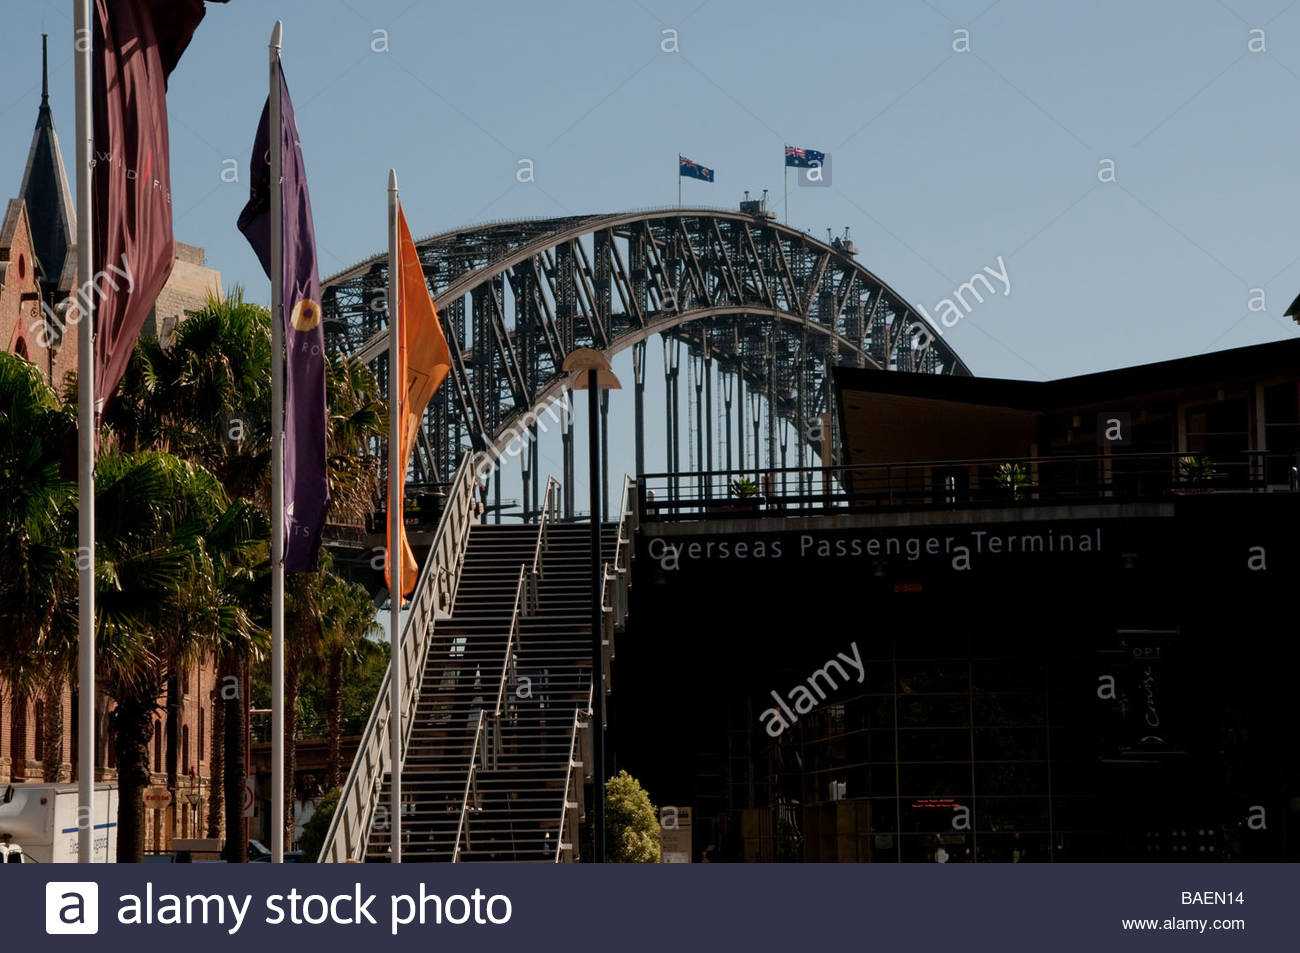 Sydney Harbour Bridge and Overseas Passenger Terminal NSW Australia NSW Australia - Stock Image